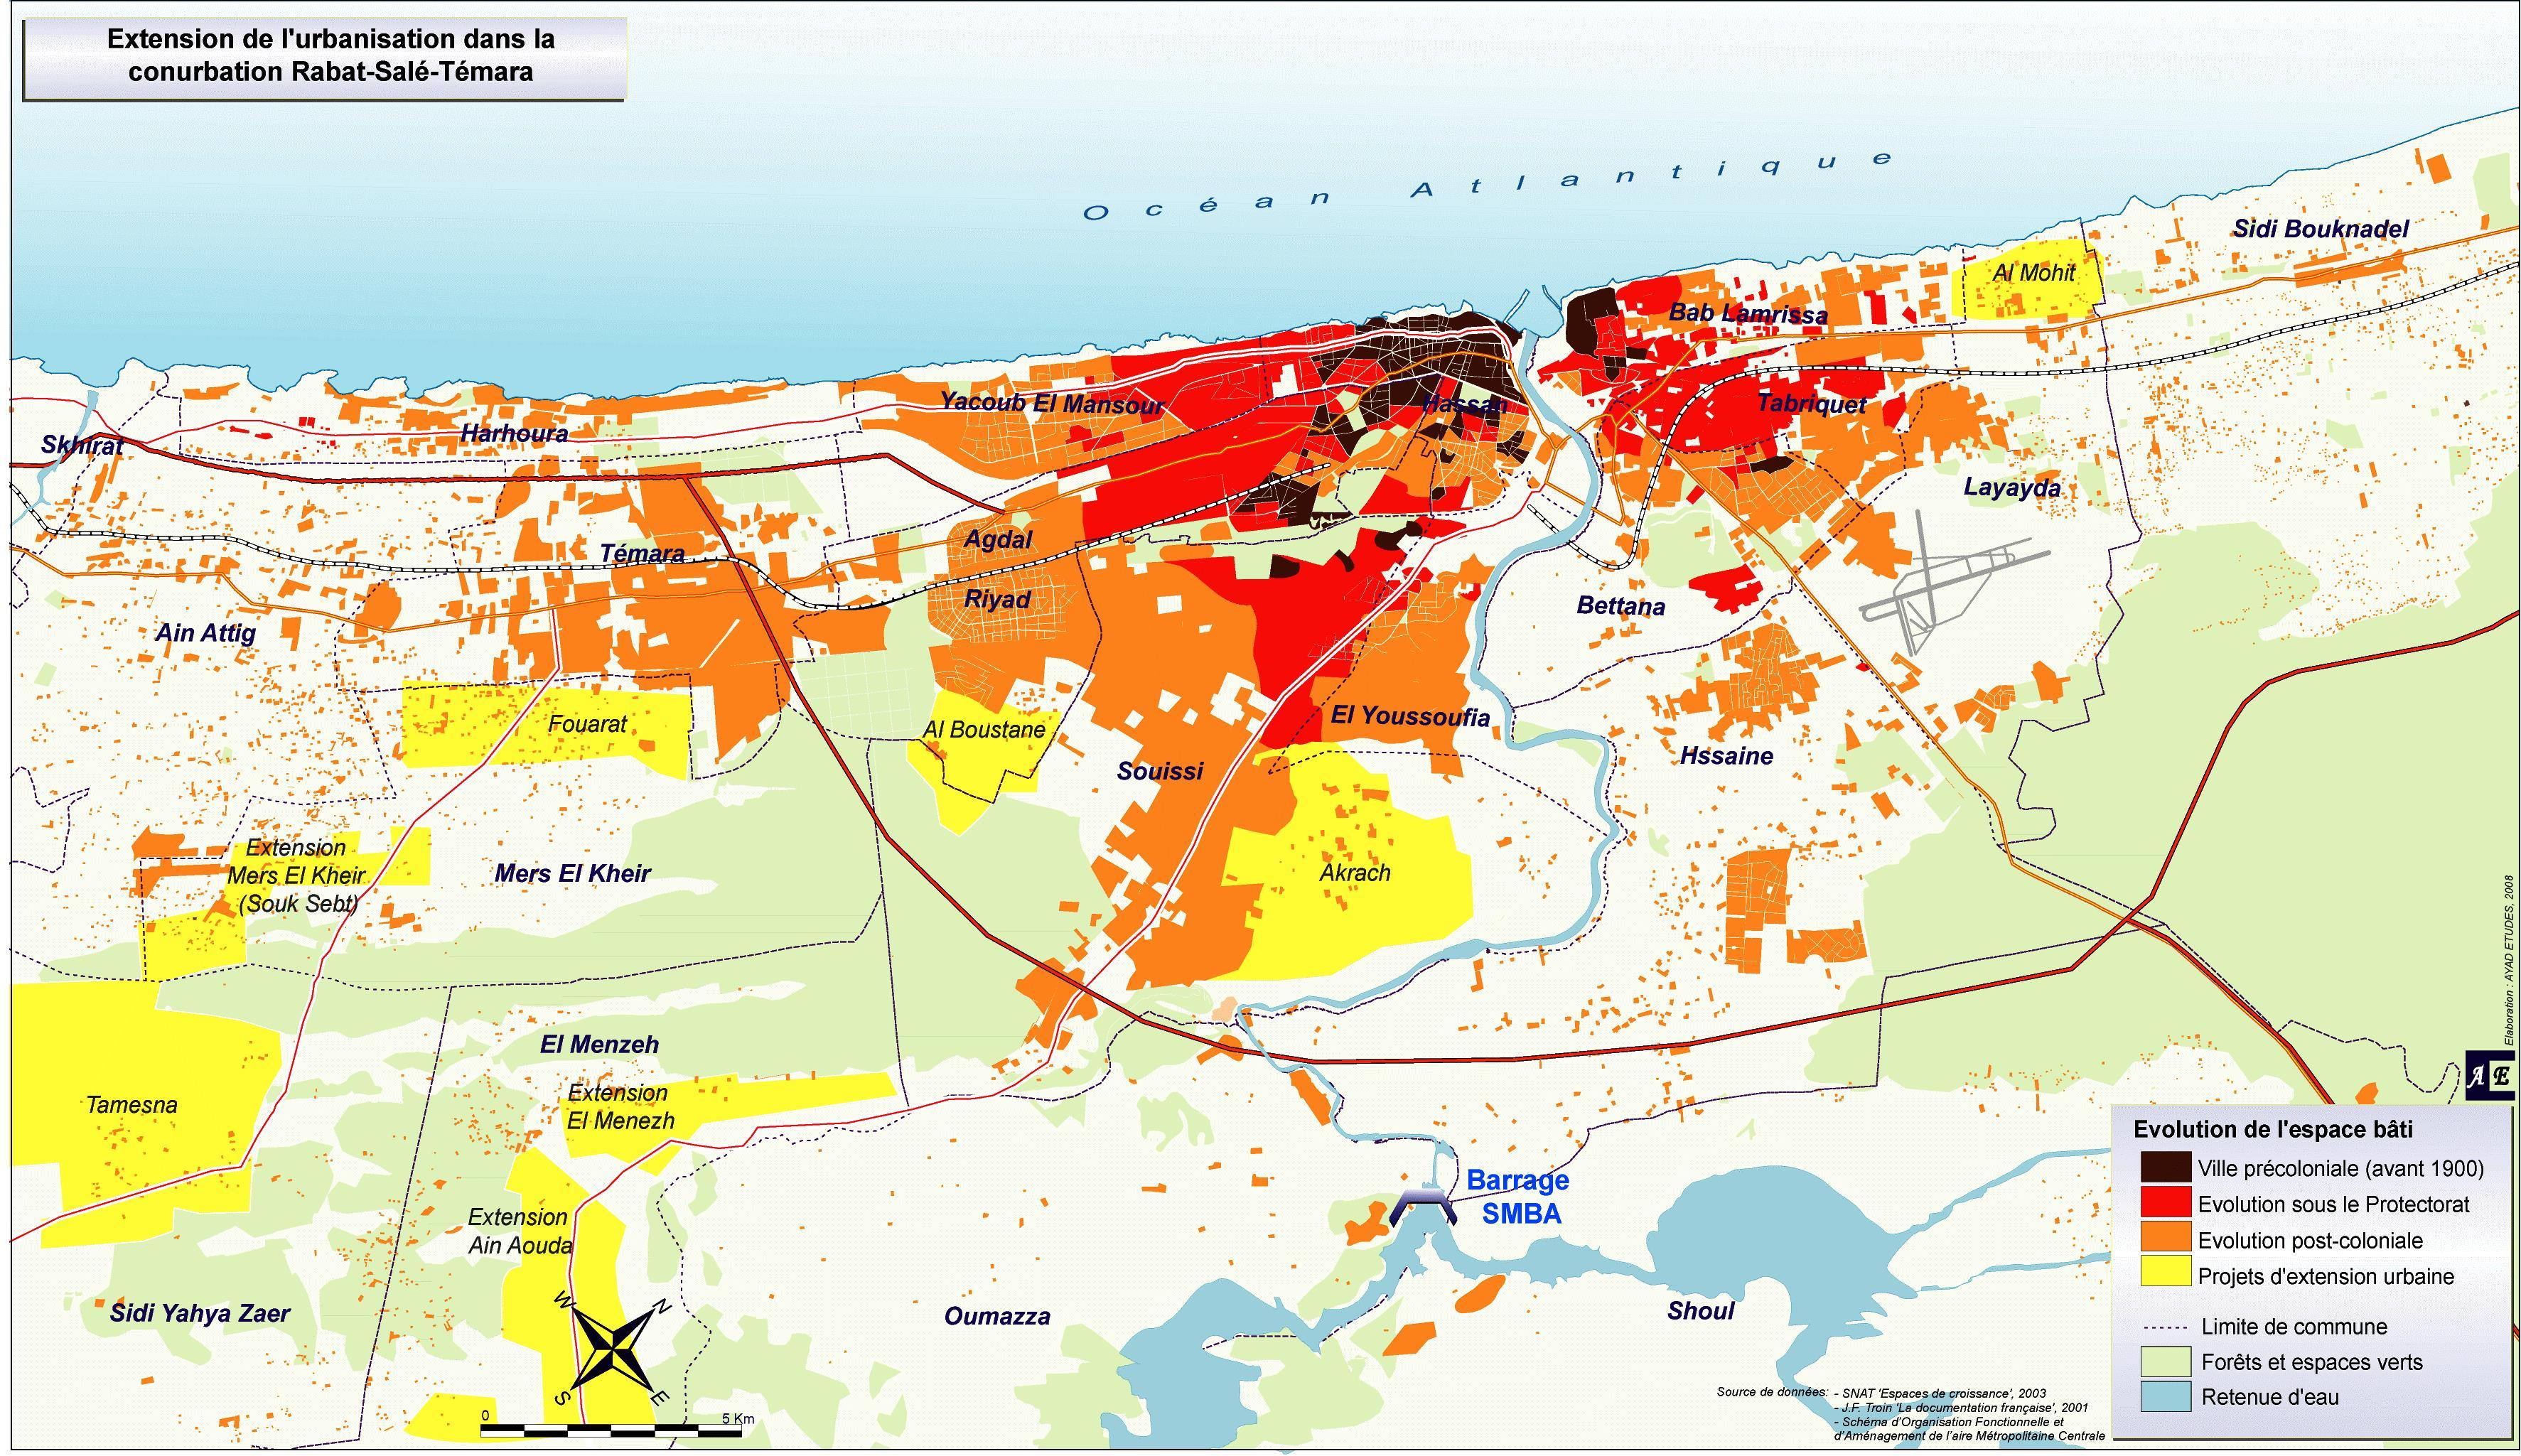 Extension de l'urbanisation